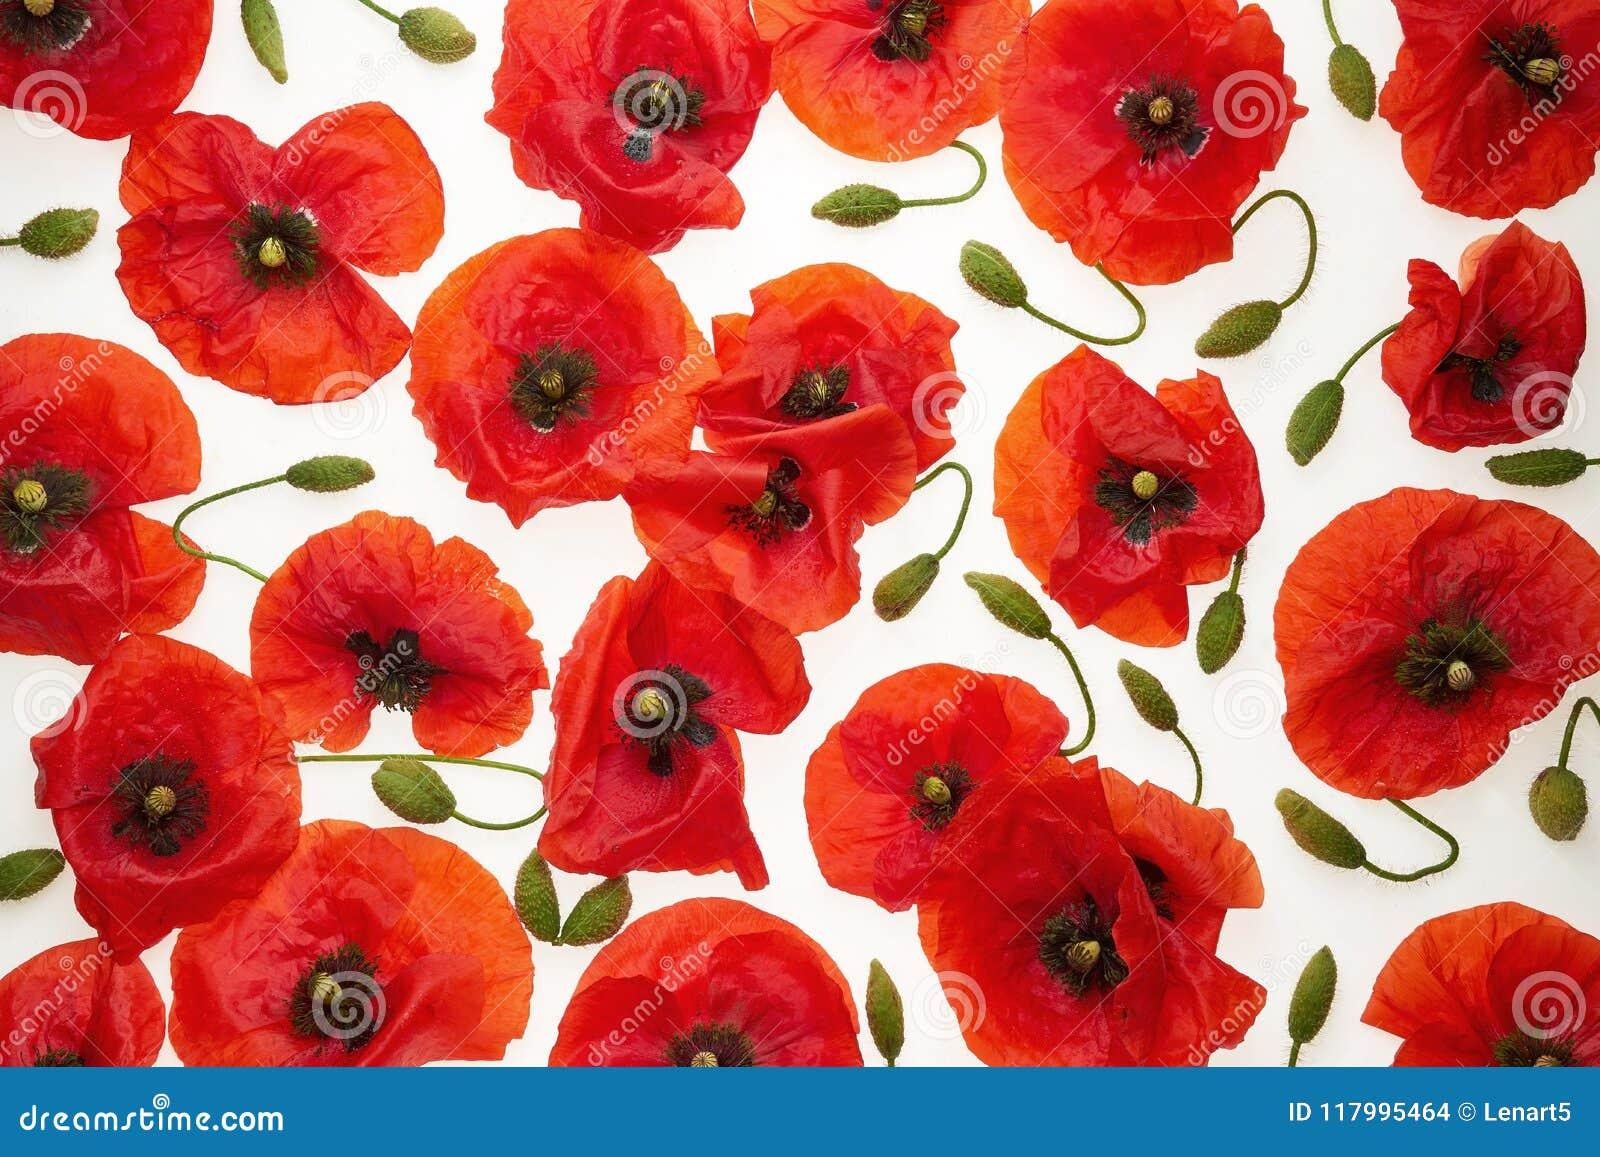 Red Poppies On White Background Wallpaper Background Stock Photo Image Of Flourishing Beautiful 117995464